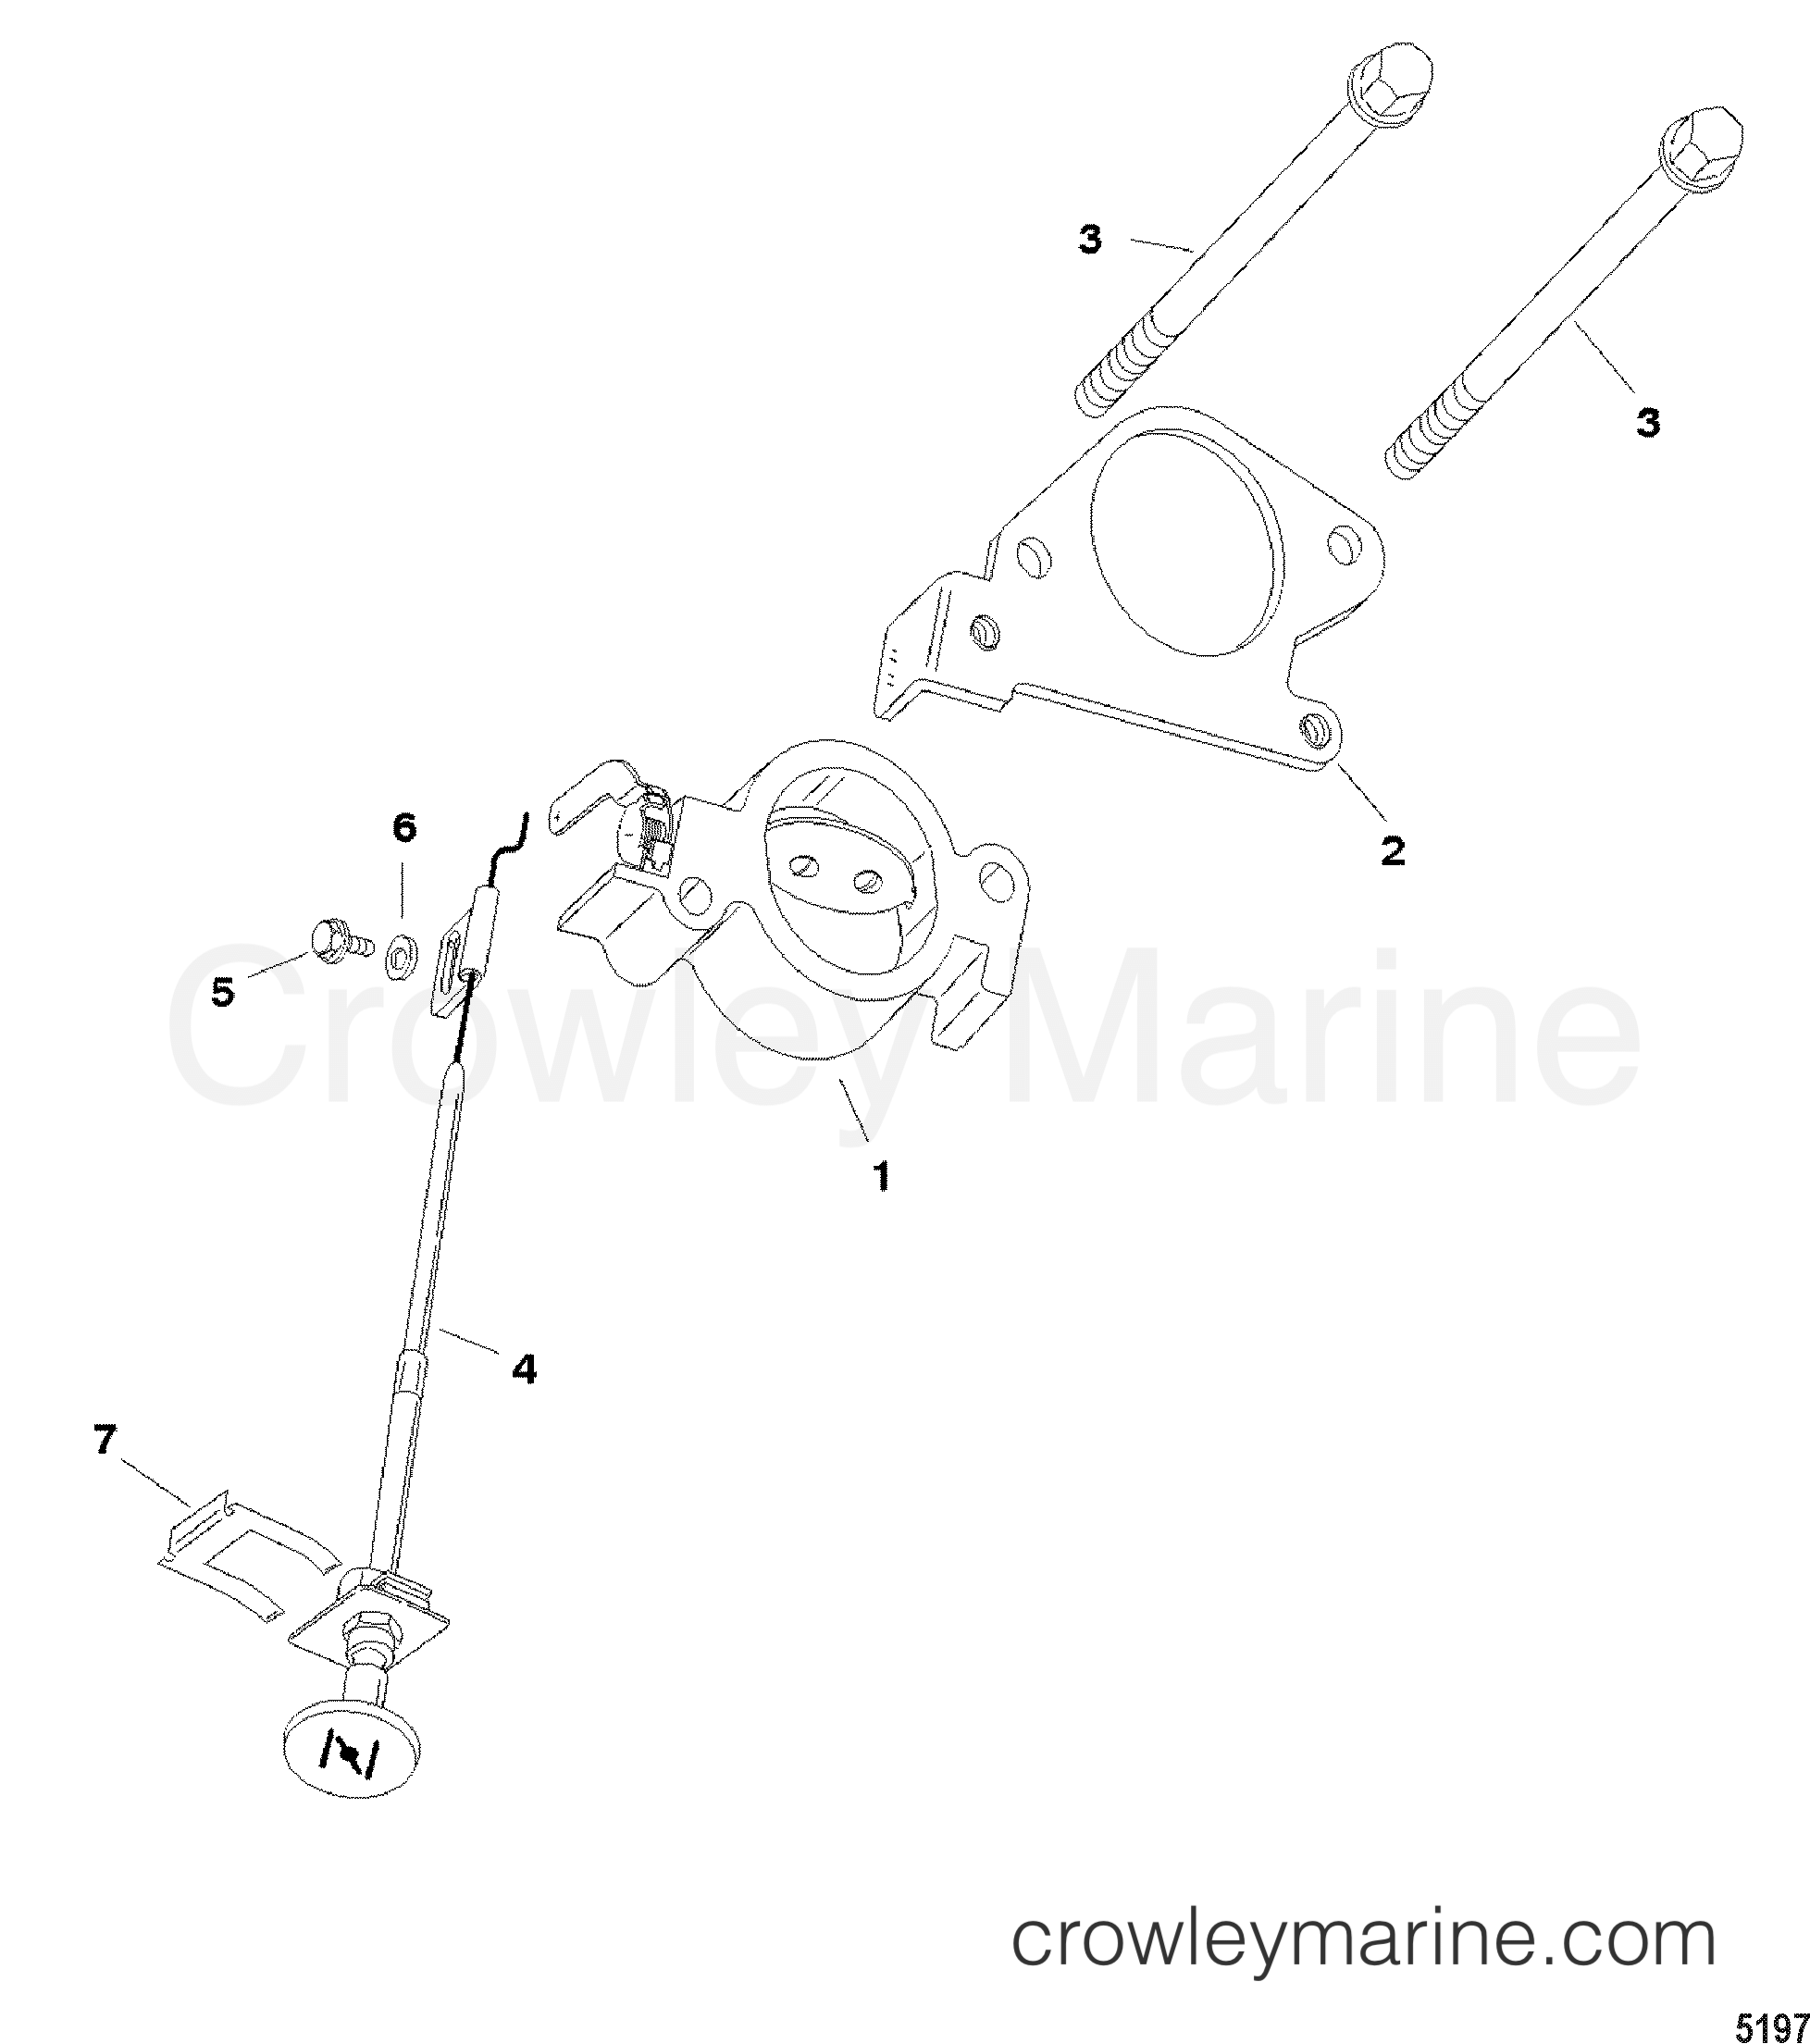 2004 Mercury Outboard 40 [ML] - 1041213CF - CHOKE KIT section